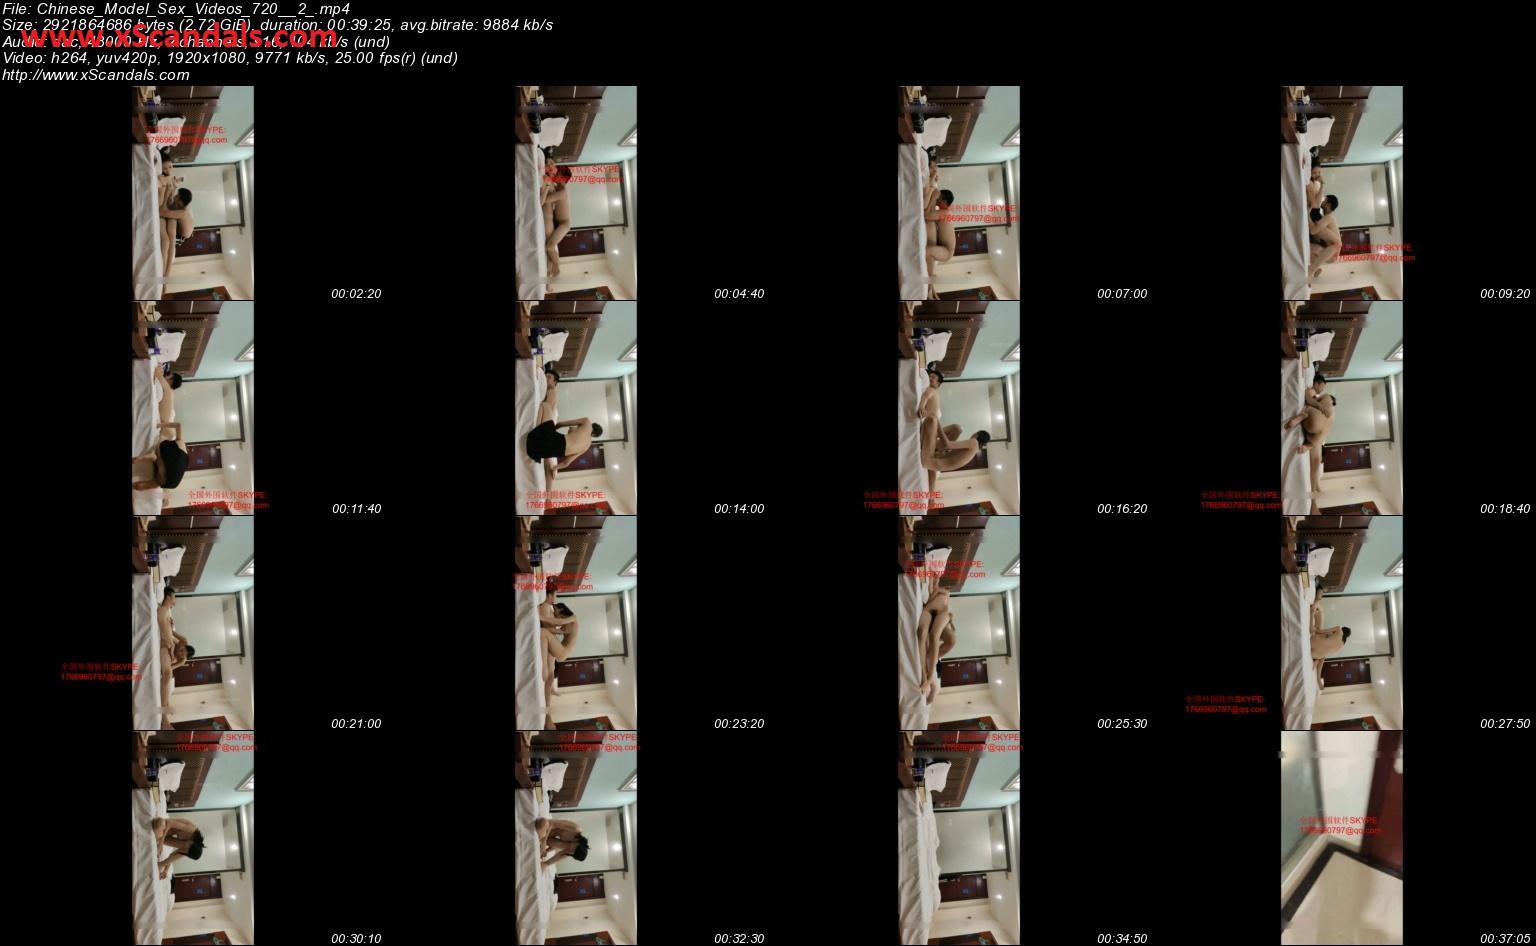 Chinese_Model_Sex_Videos_720__2_.jpeg